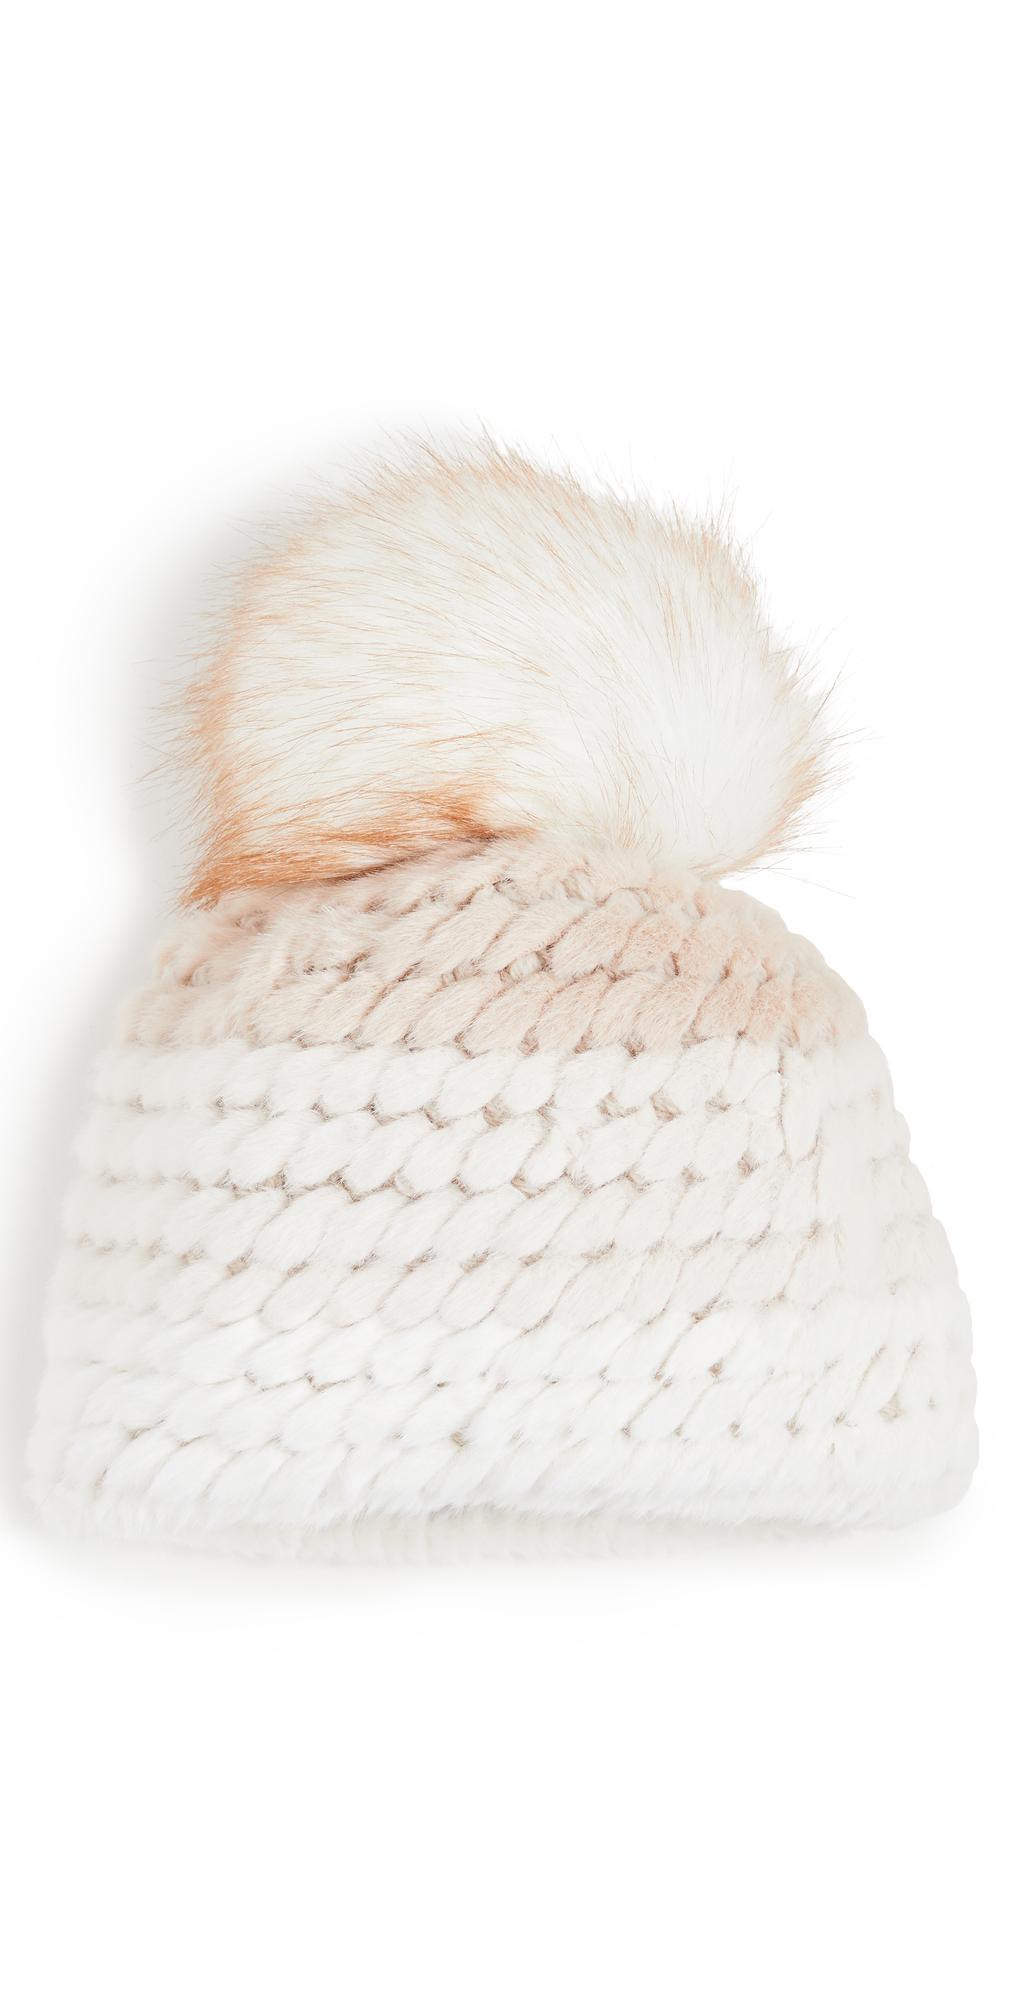 Colorblock Faux Fur Pineapple Hat with Faux Fur Pom